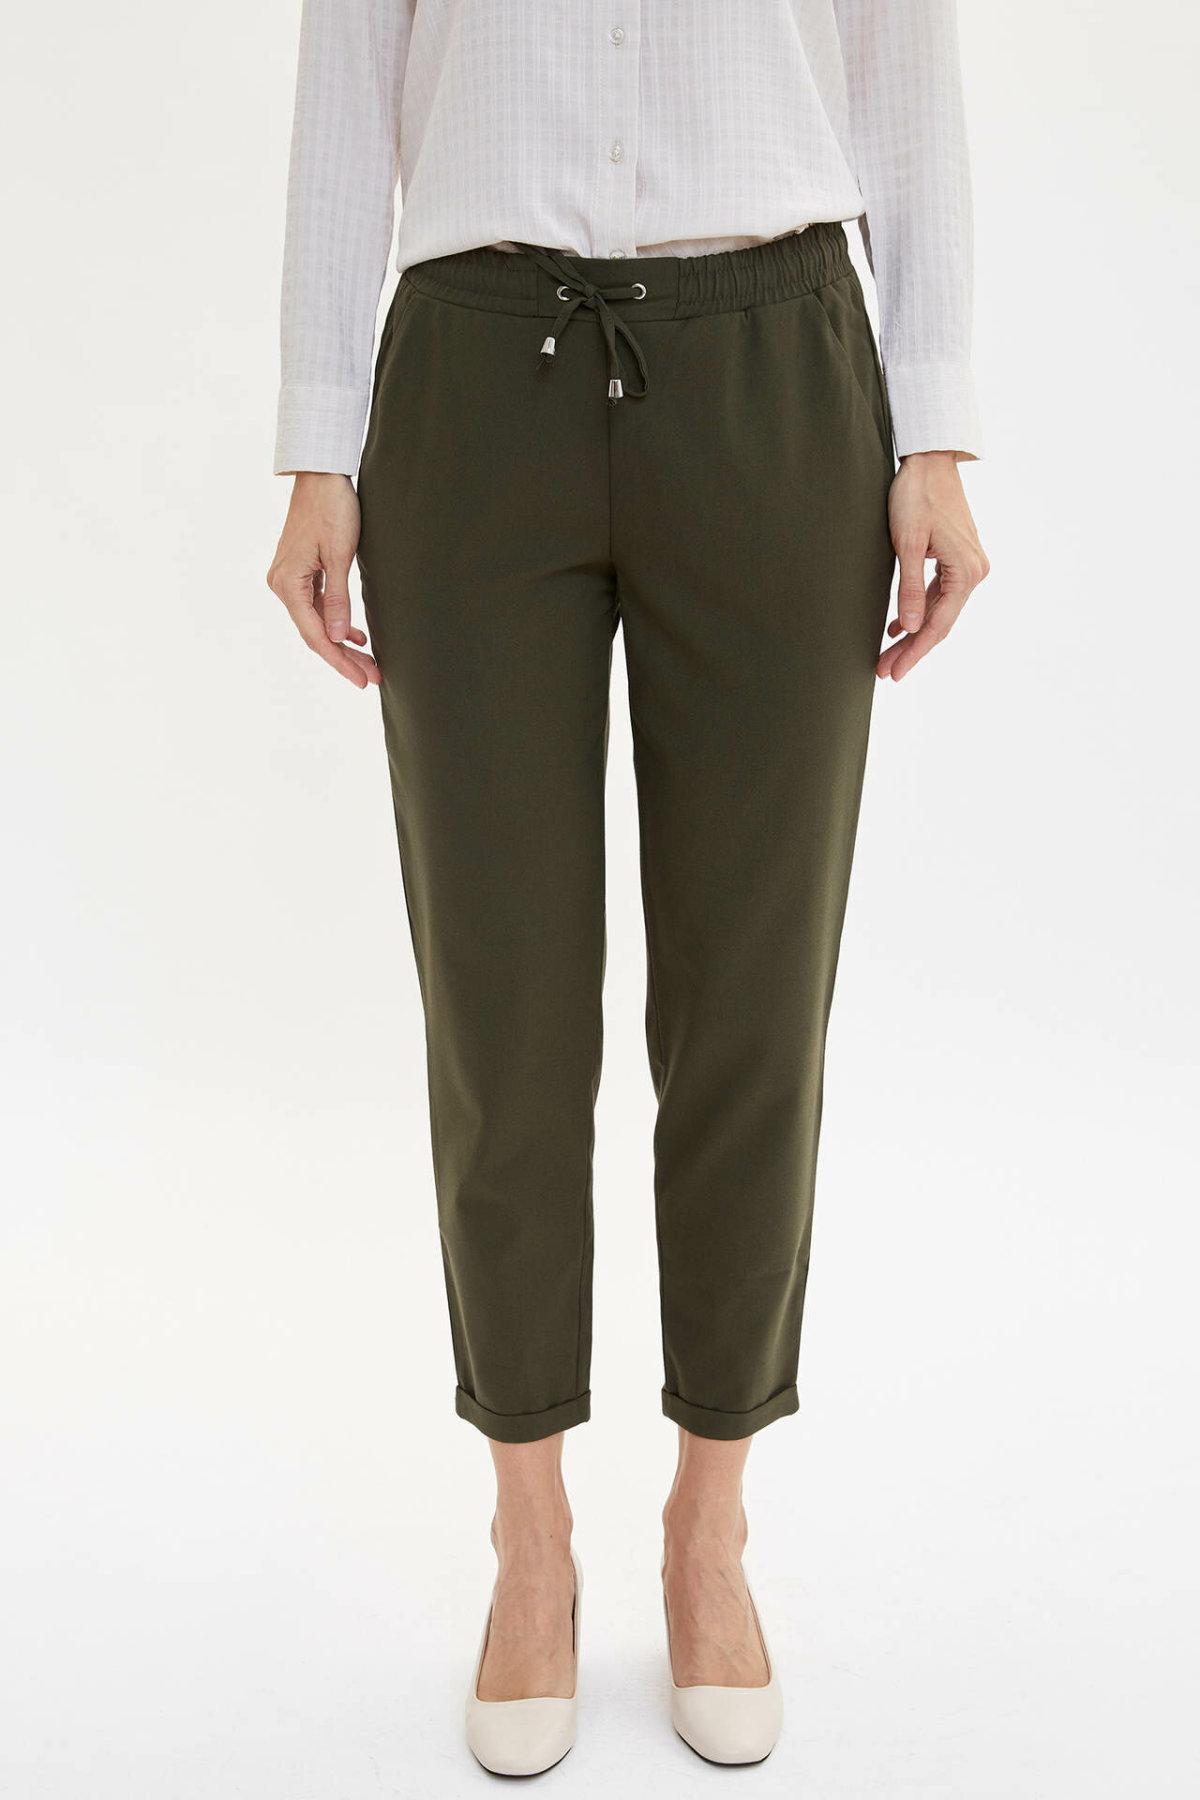 DeFacto Fashion Women Drawstring Waist Trousers Solid Casual Harem Crop Pants Ladies Loose Cargo Pants Female-I4363AZ19AU